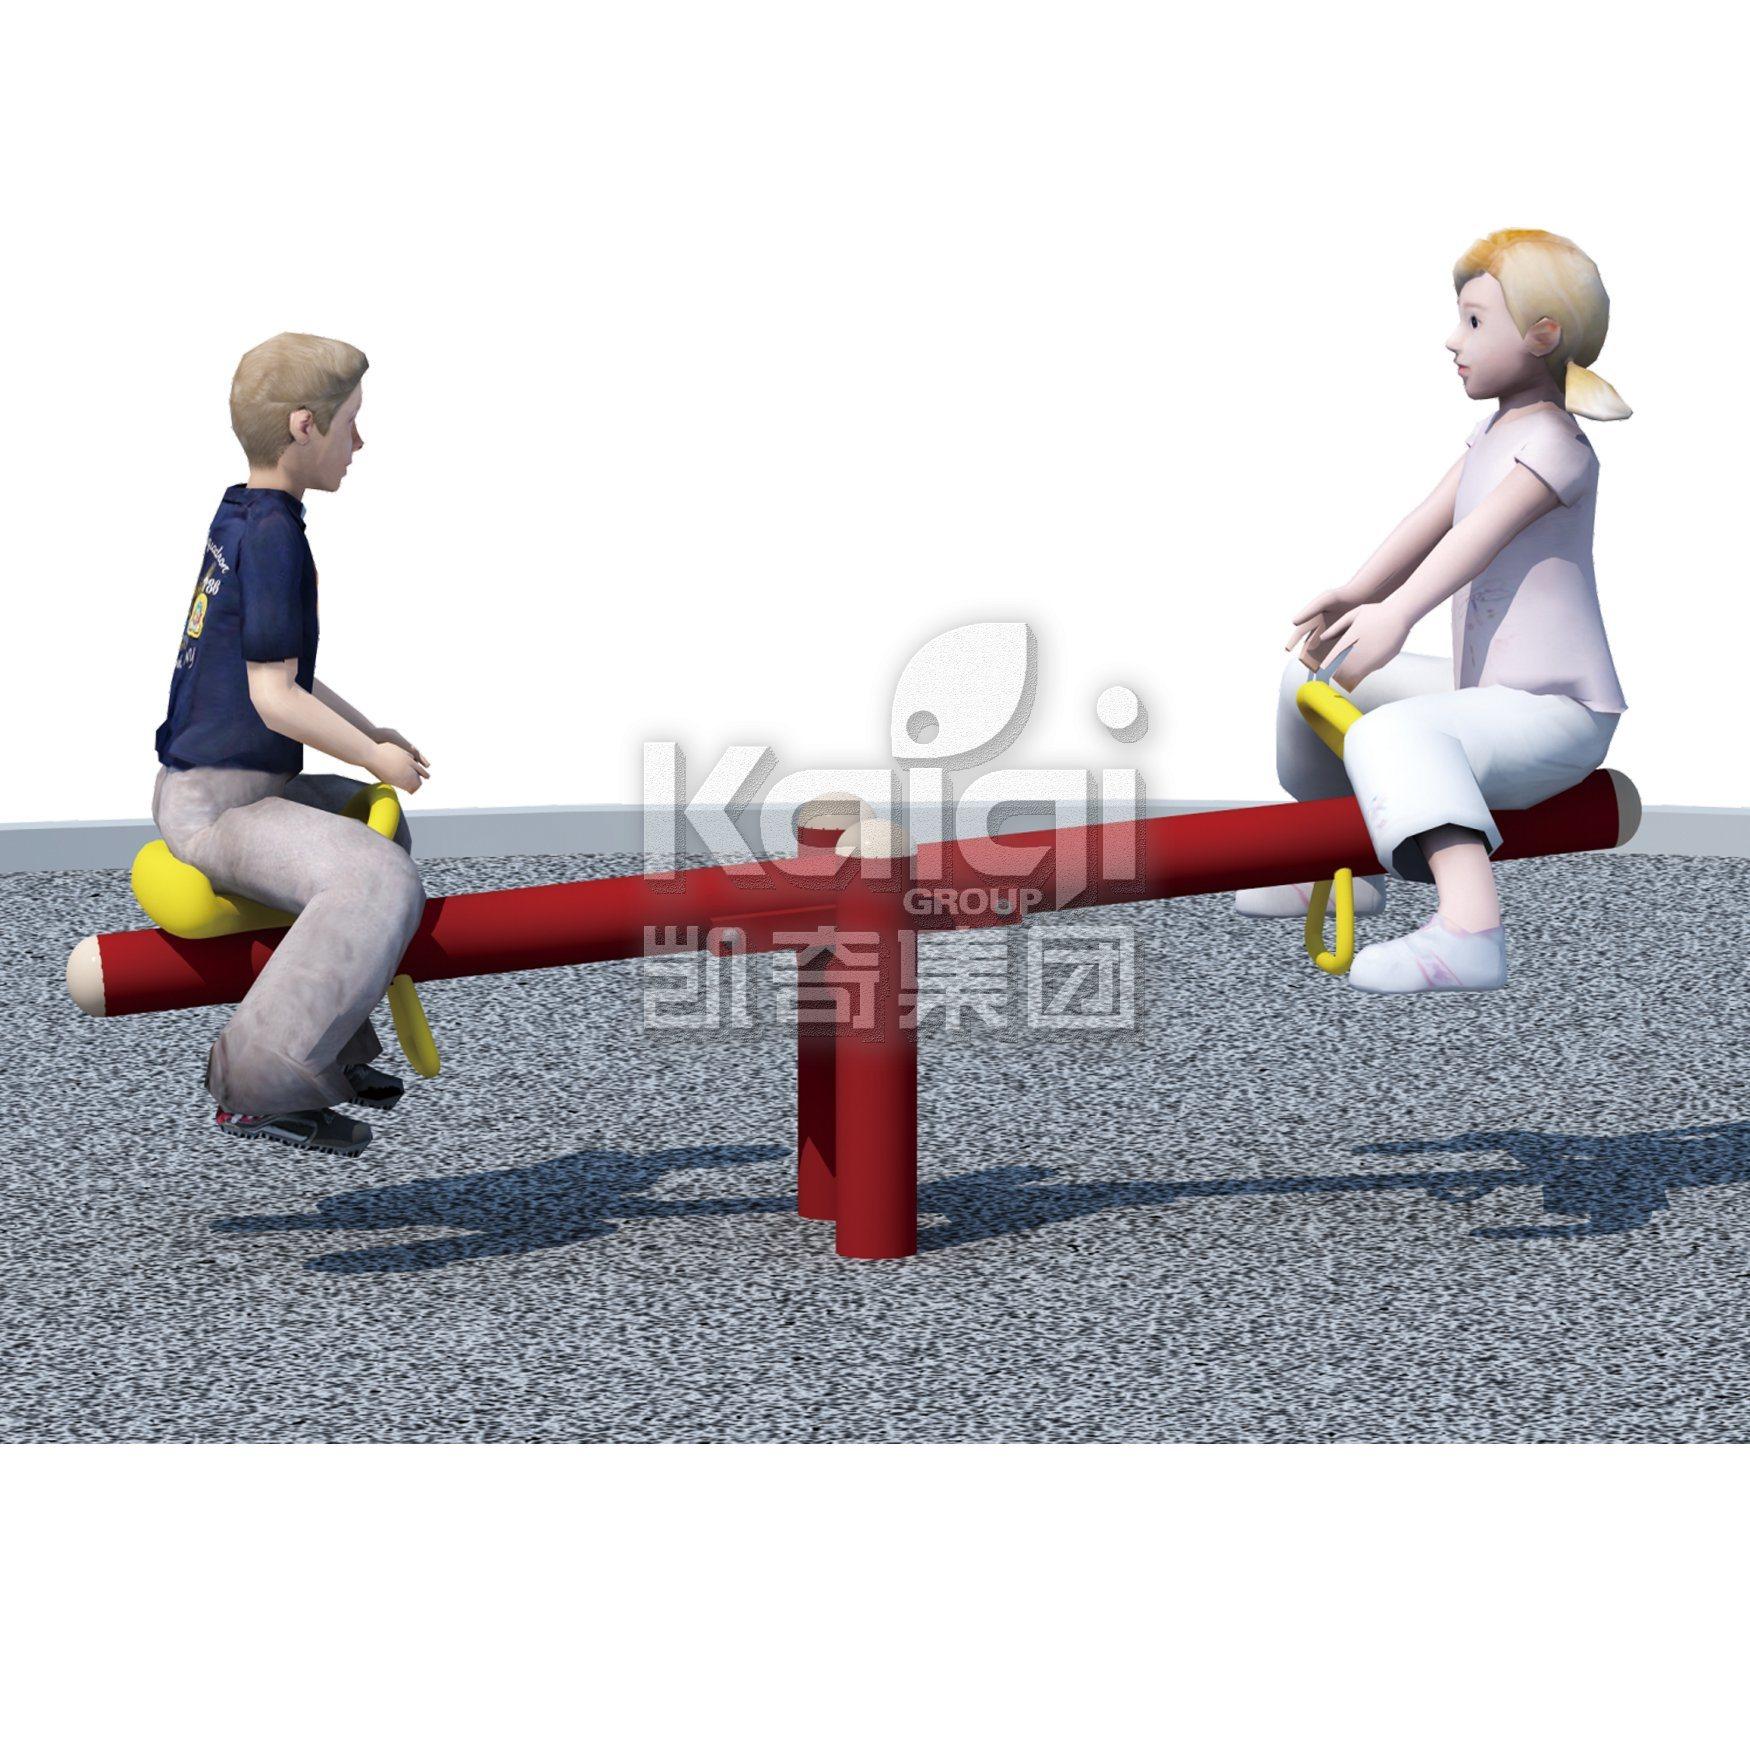 China Outdoor Playground Equipment Kids Seesaw For Park And Kindergarten Equipmen